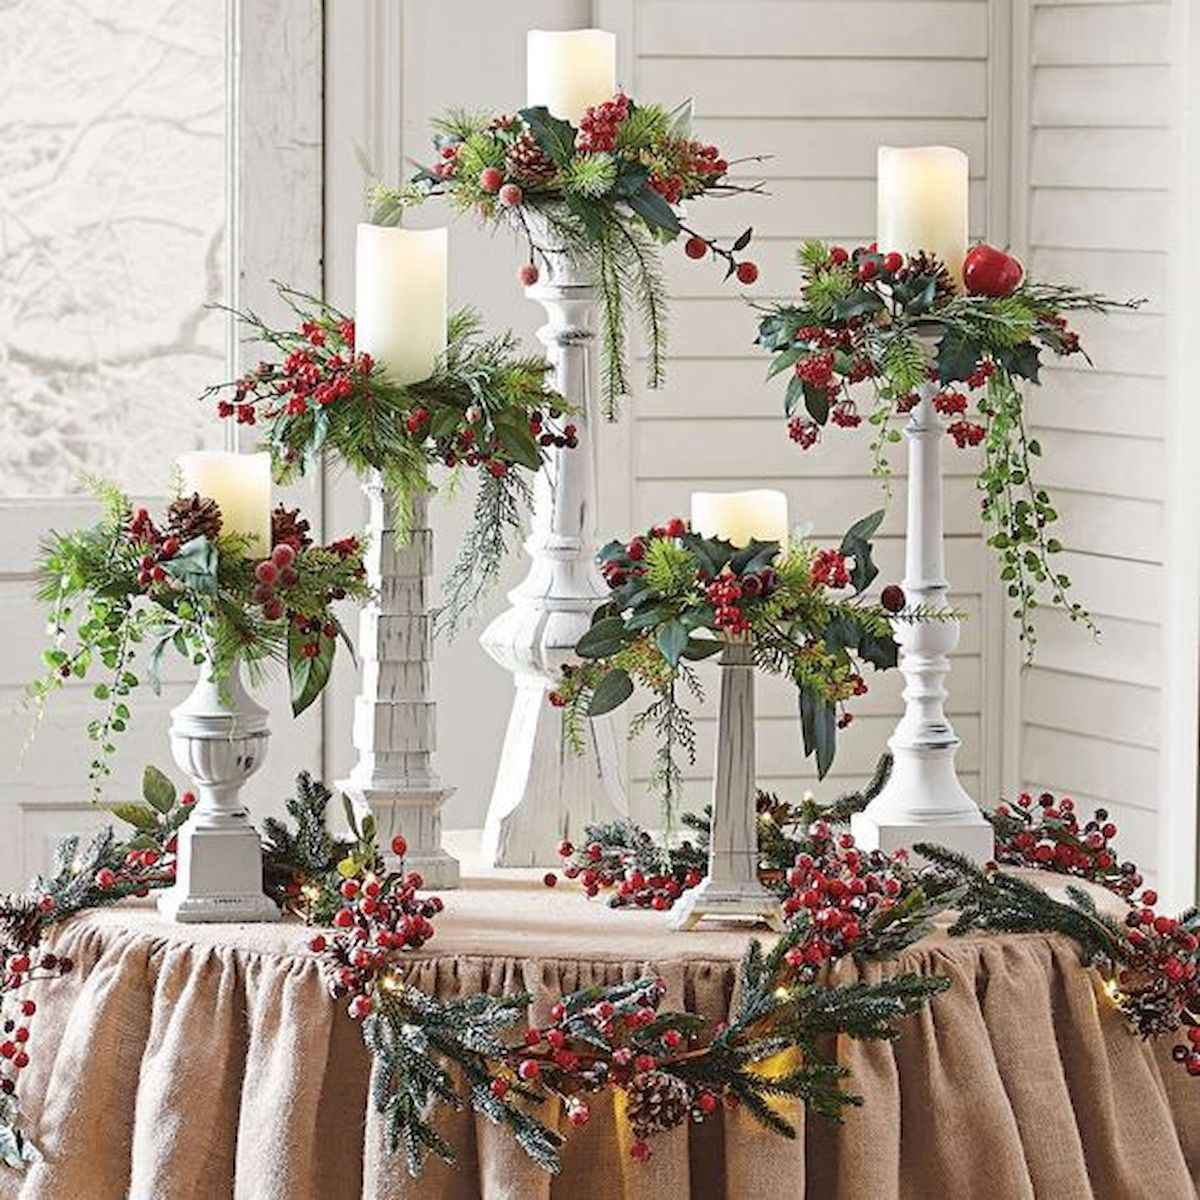 35 Beautiful Christmas Decor Ideas Table Centerpiece (24)